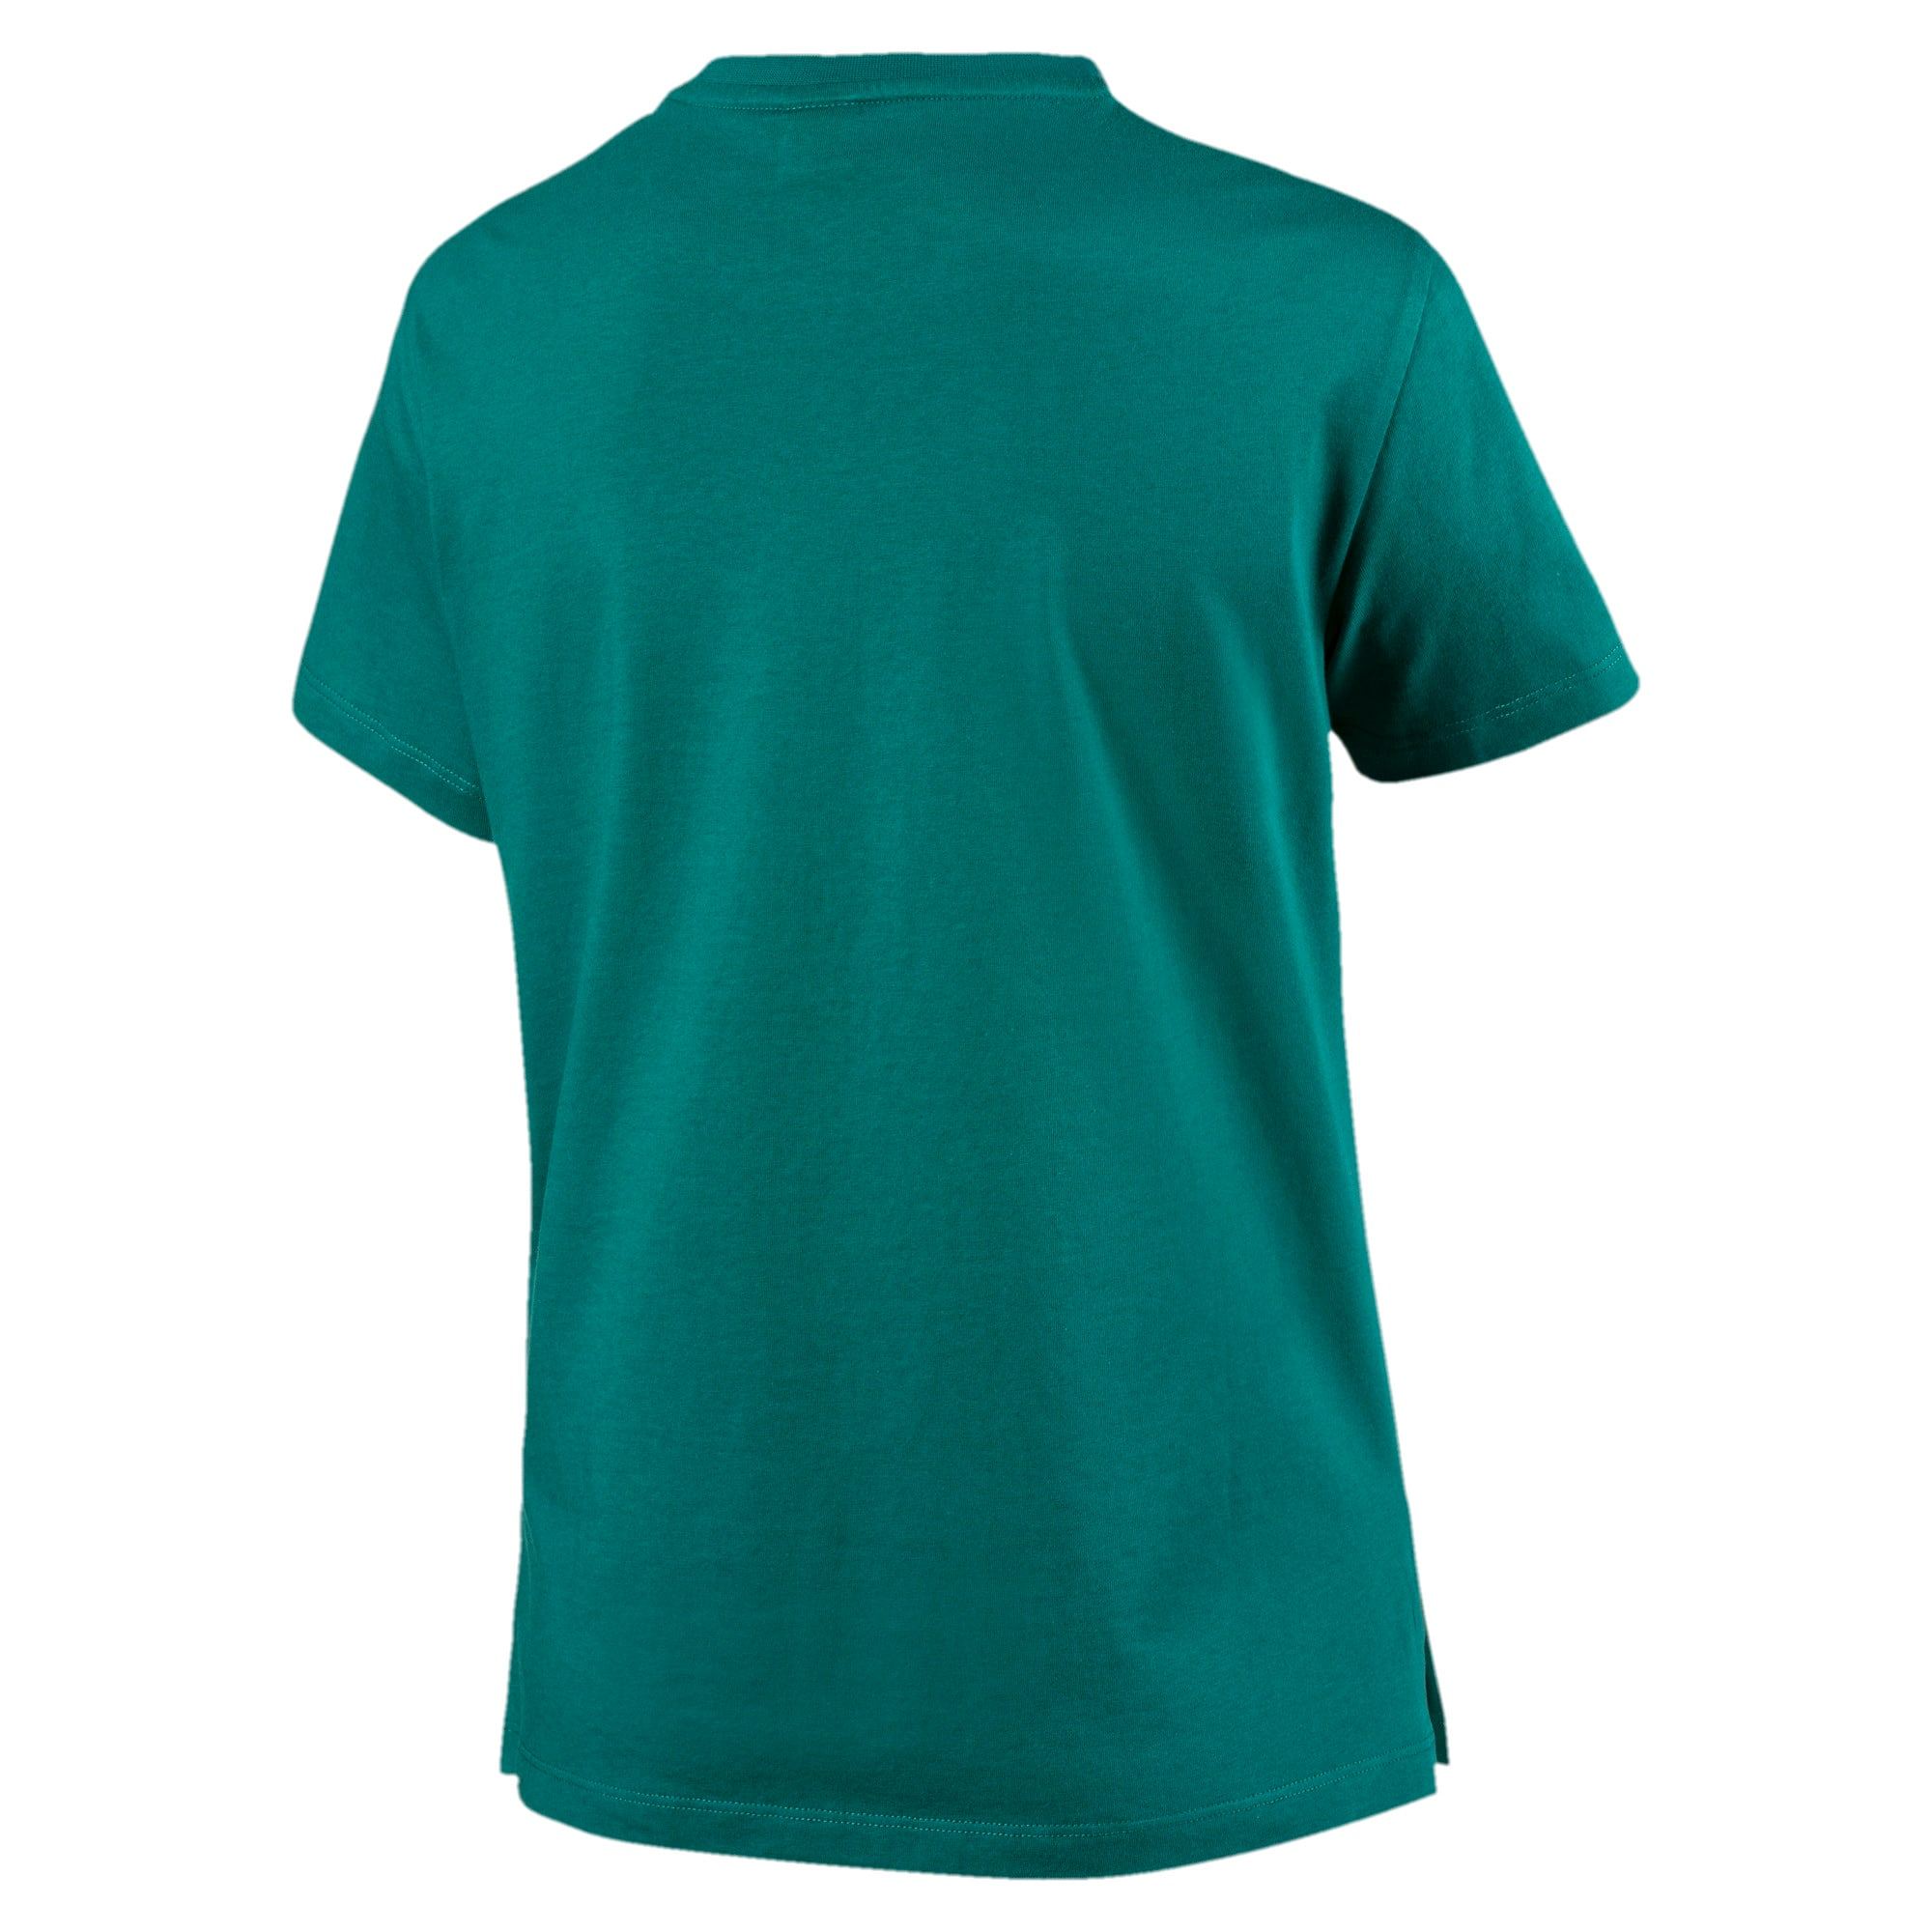 Miniatura 5 de Camiseta Classics con logotipo para mujer, Verde azulado, mediano